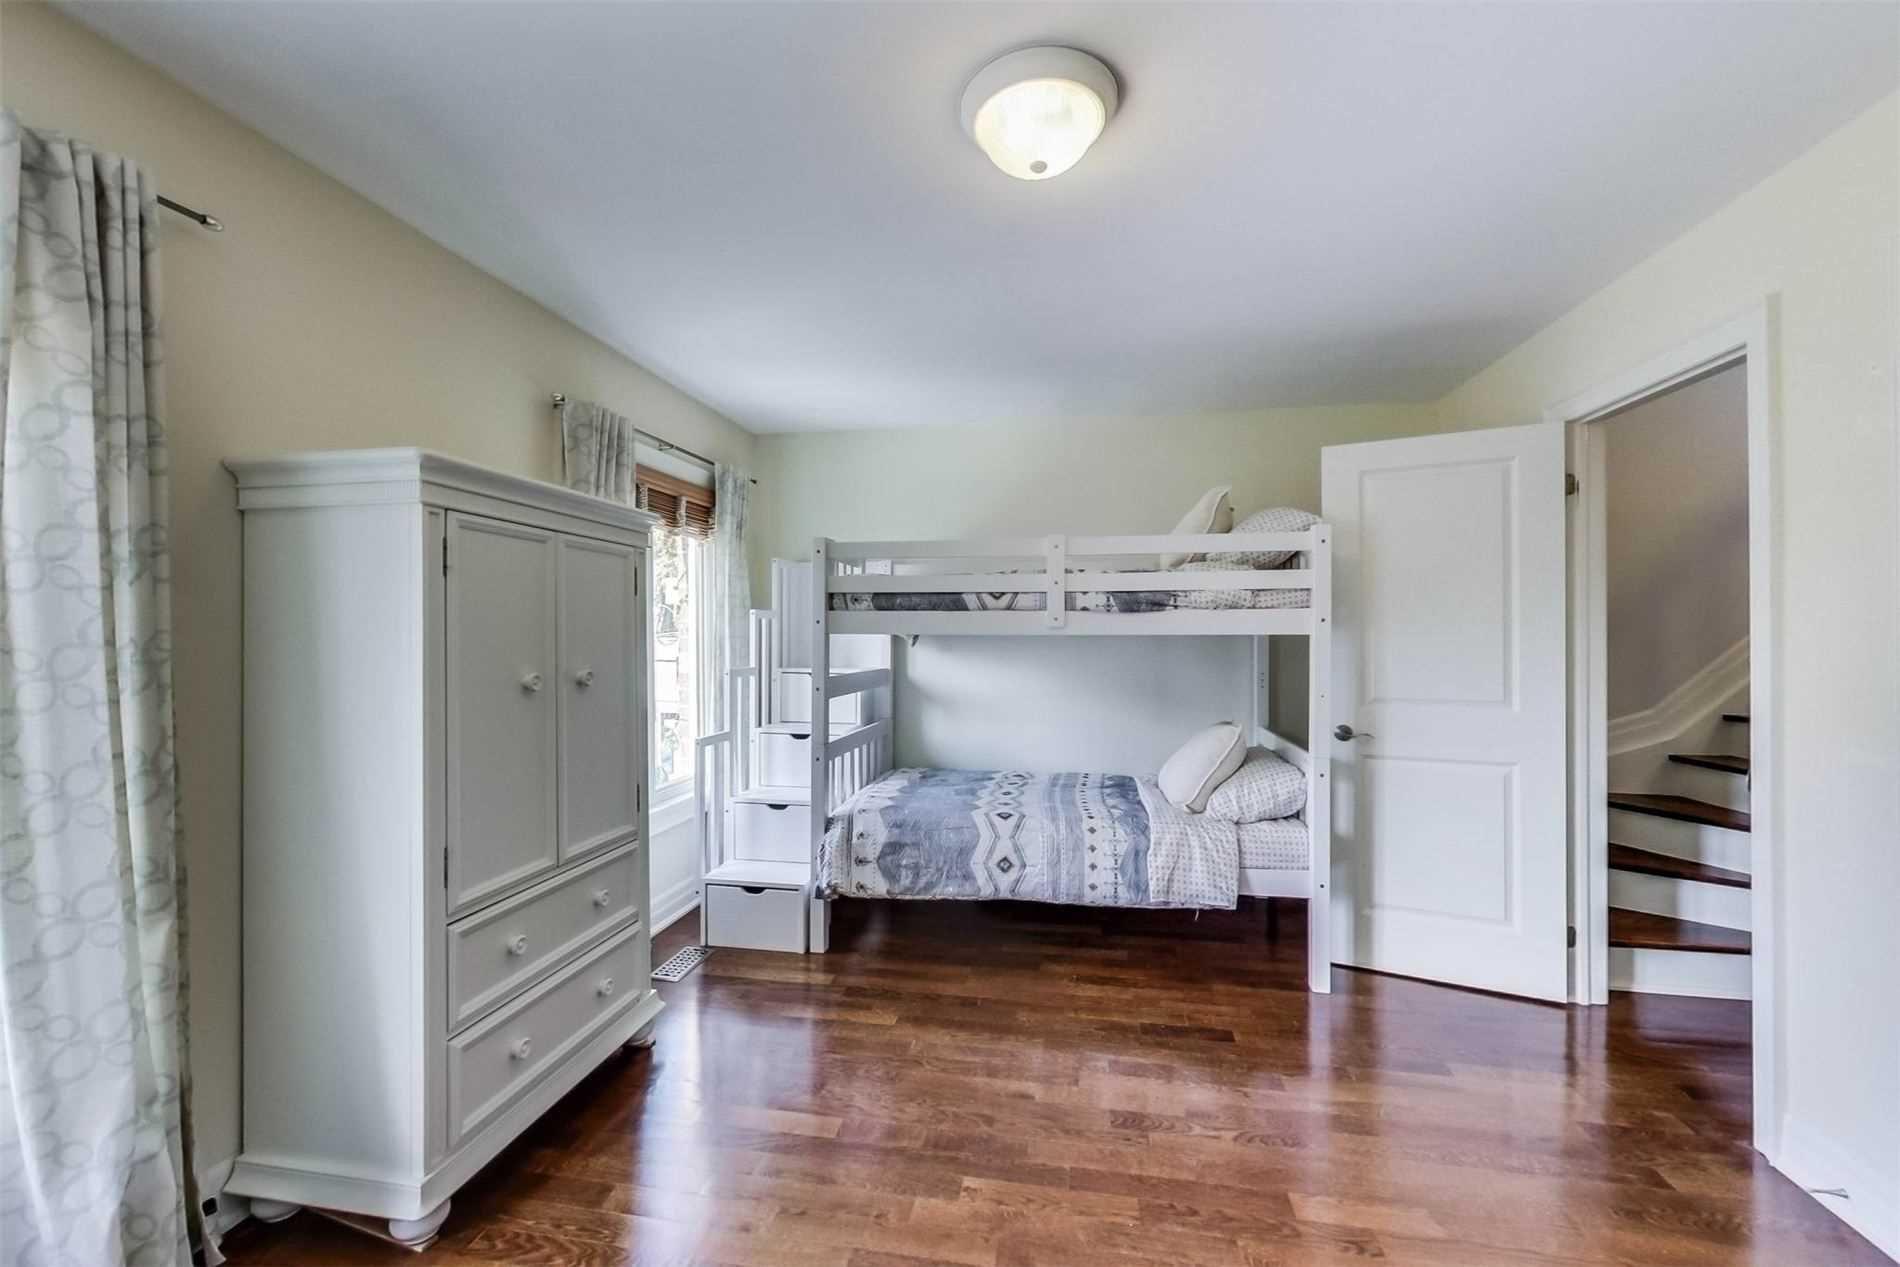 Photo 17: Photos: 213 Heward Avenue in Toronto: South Riverdale House (3-Storey) for sale (Toronto E01)  : MLS®# E4941877